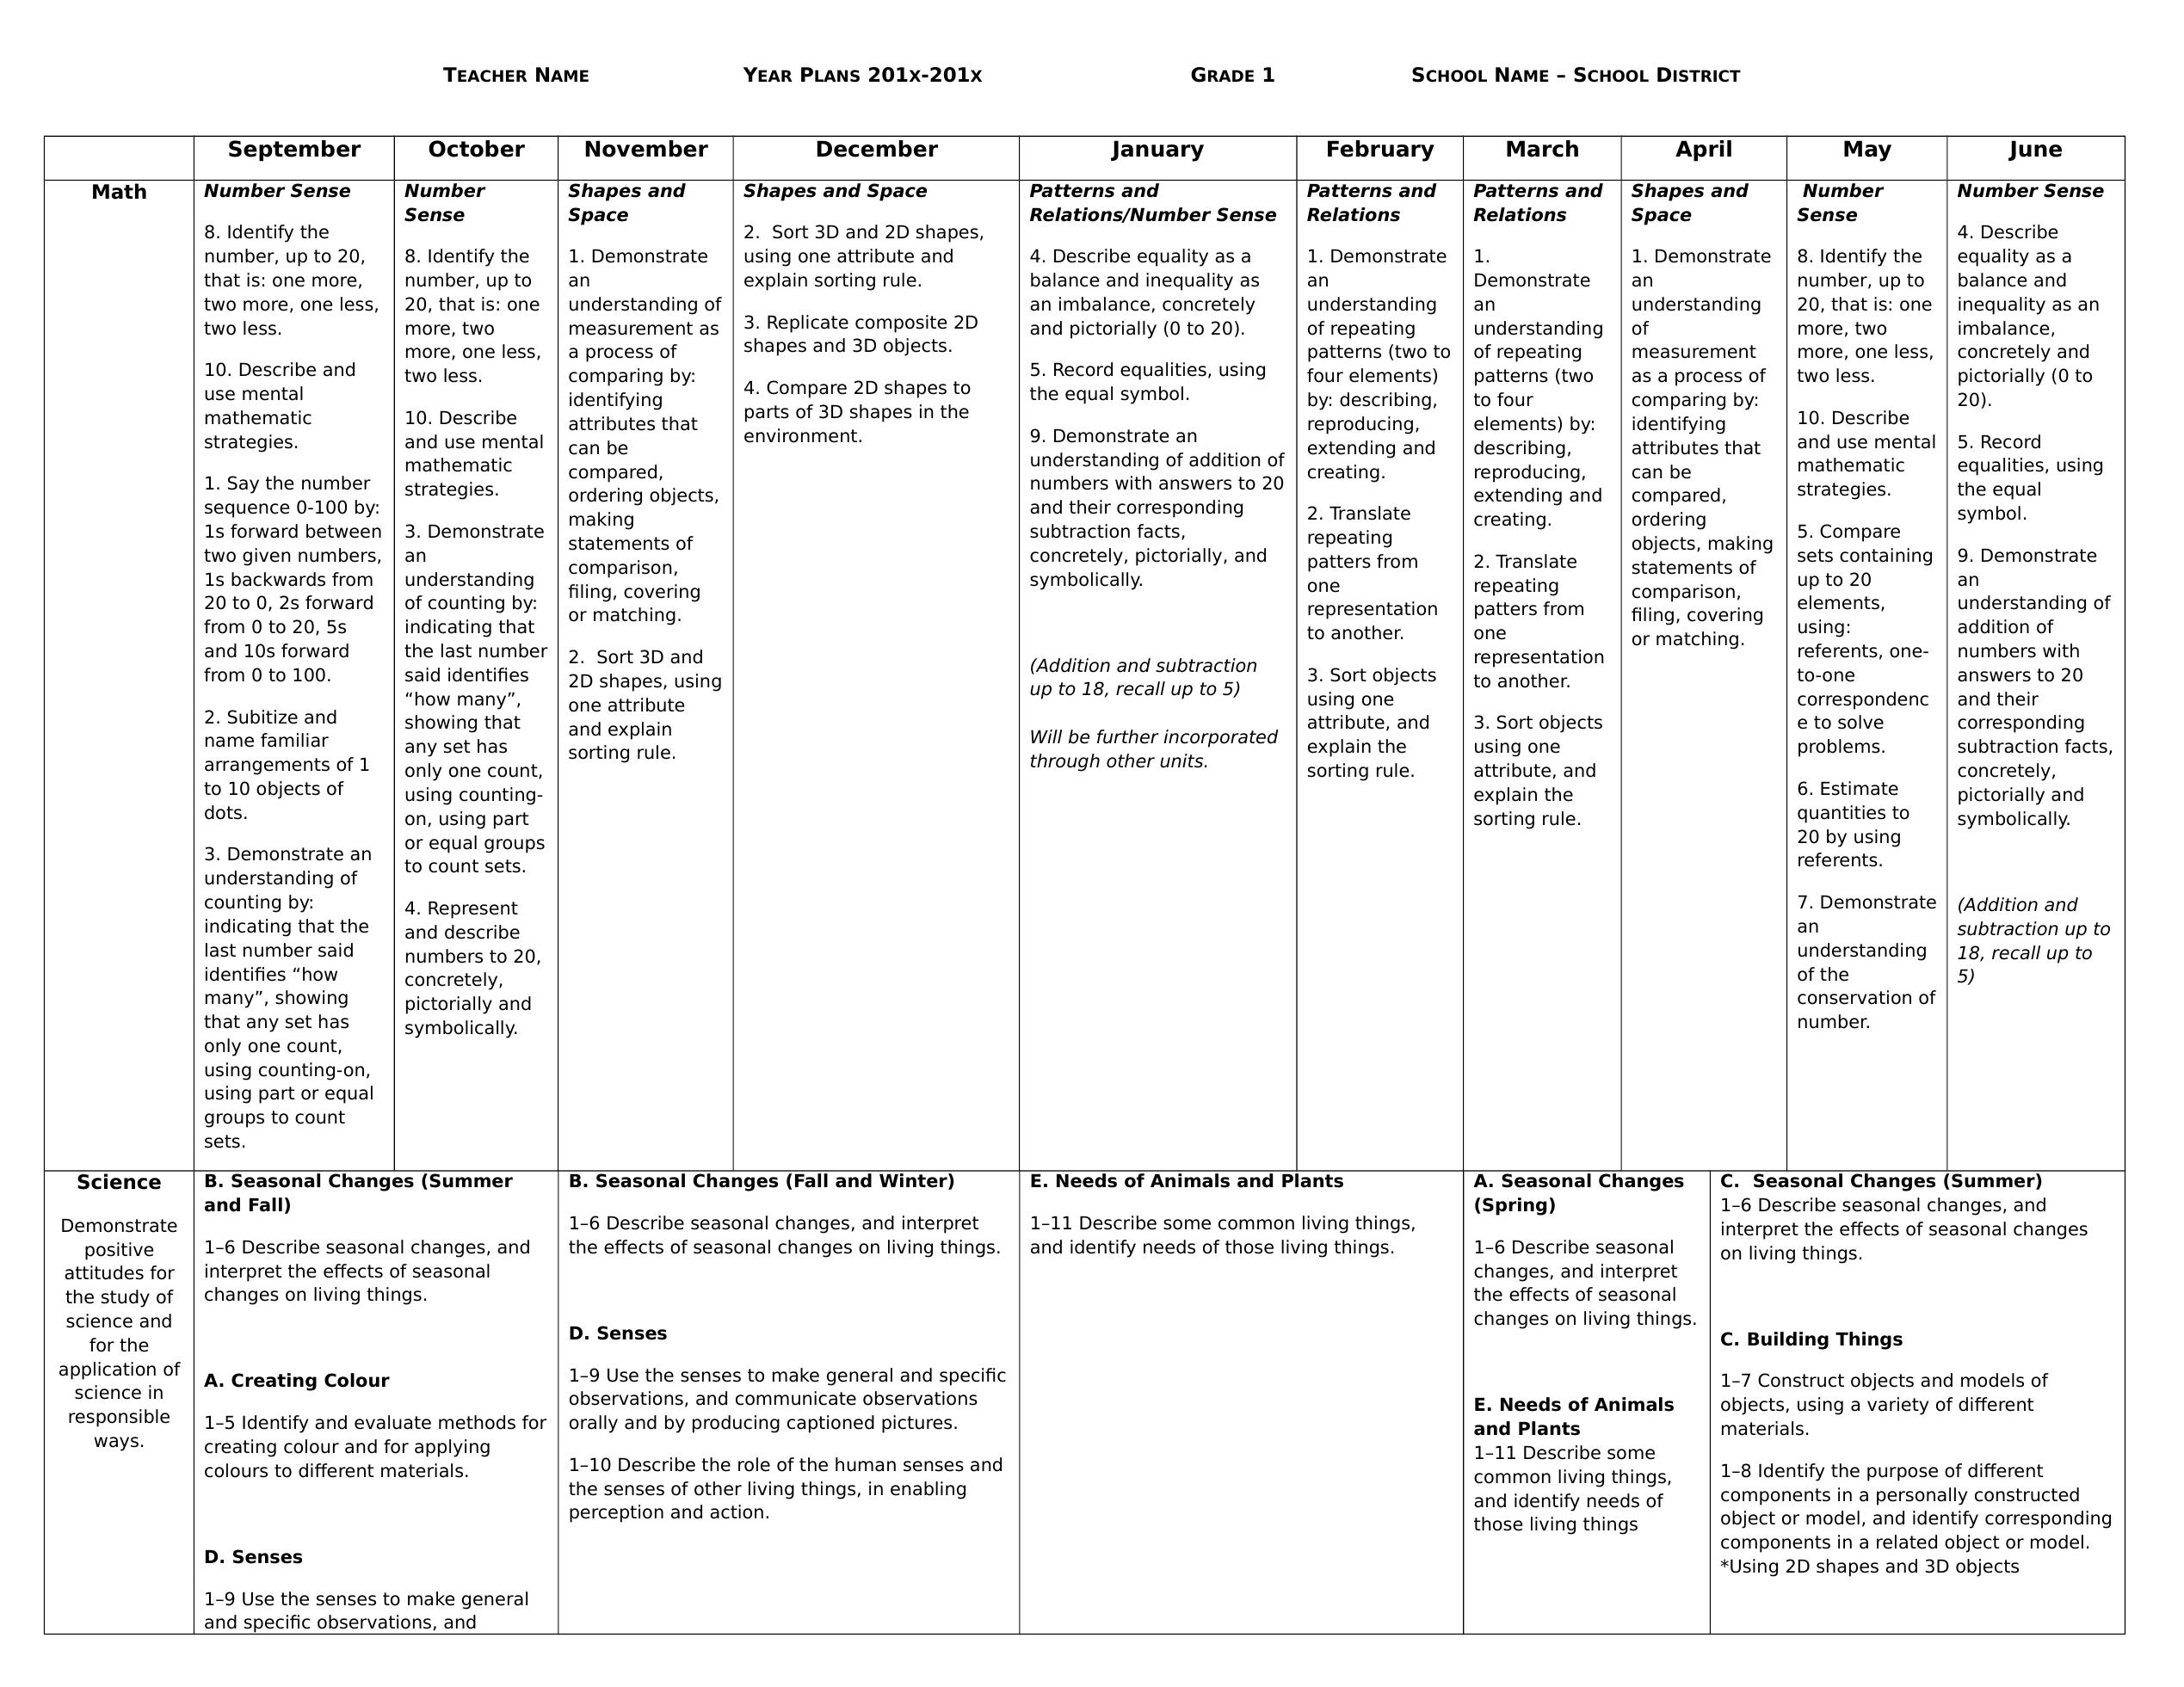 Grade 1 Long Range Year Plan Resource Preview